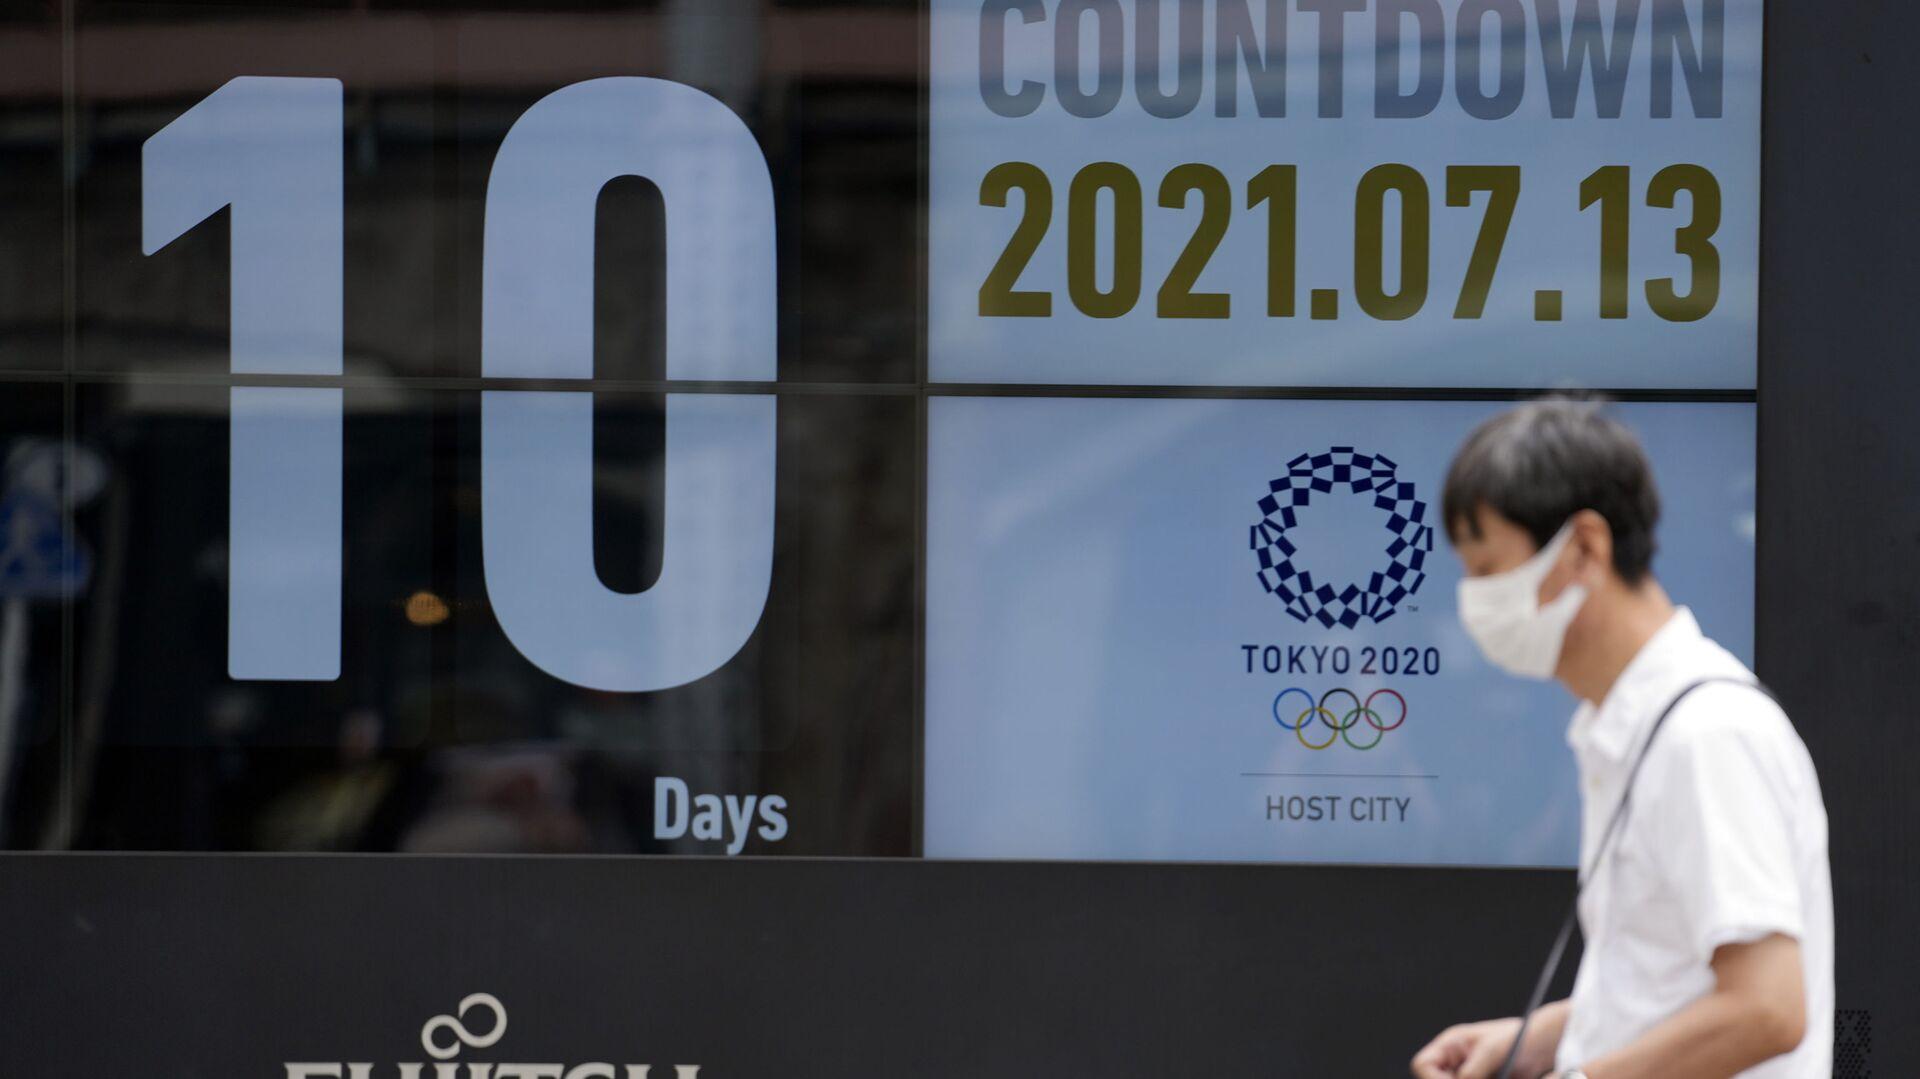 Мужчина в маске напротив календаря обратного отсчета до начала Олимпиады-2002 в Токио  - Sputnik Italia, 1920, 13.07.2021